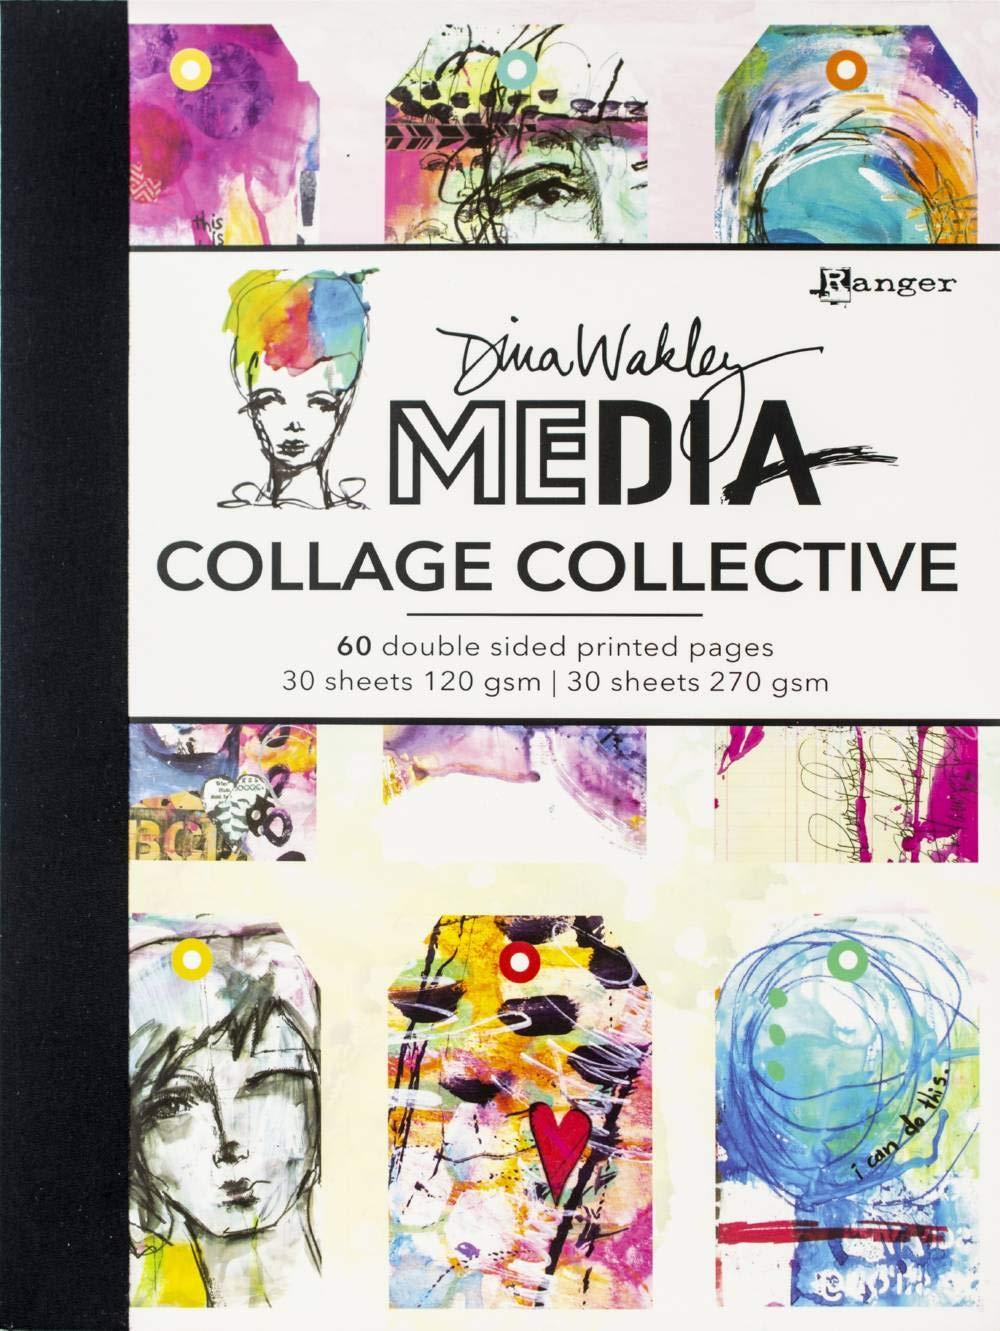 Ranger RGRMDA.66095 DWM Media Collage Collective